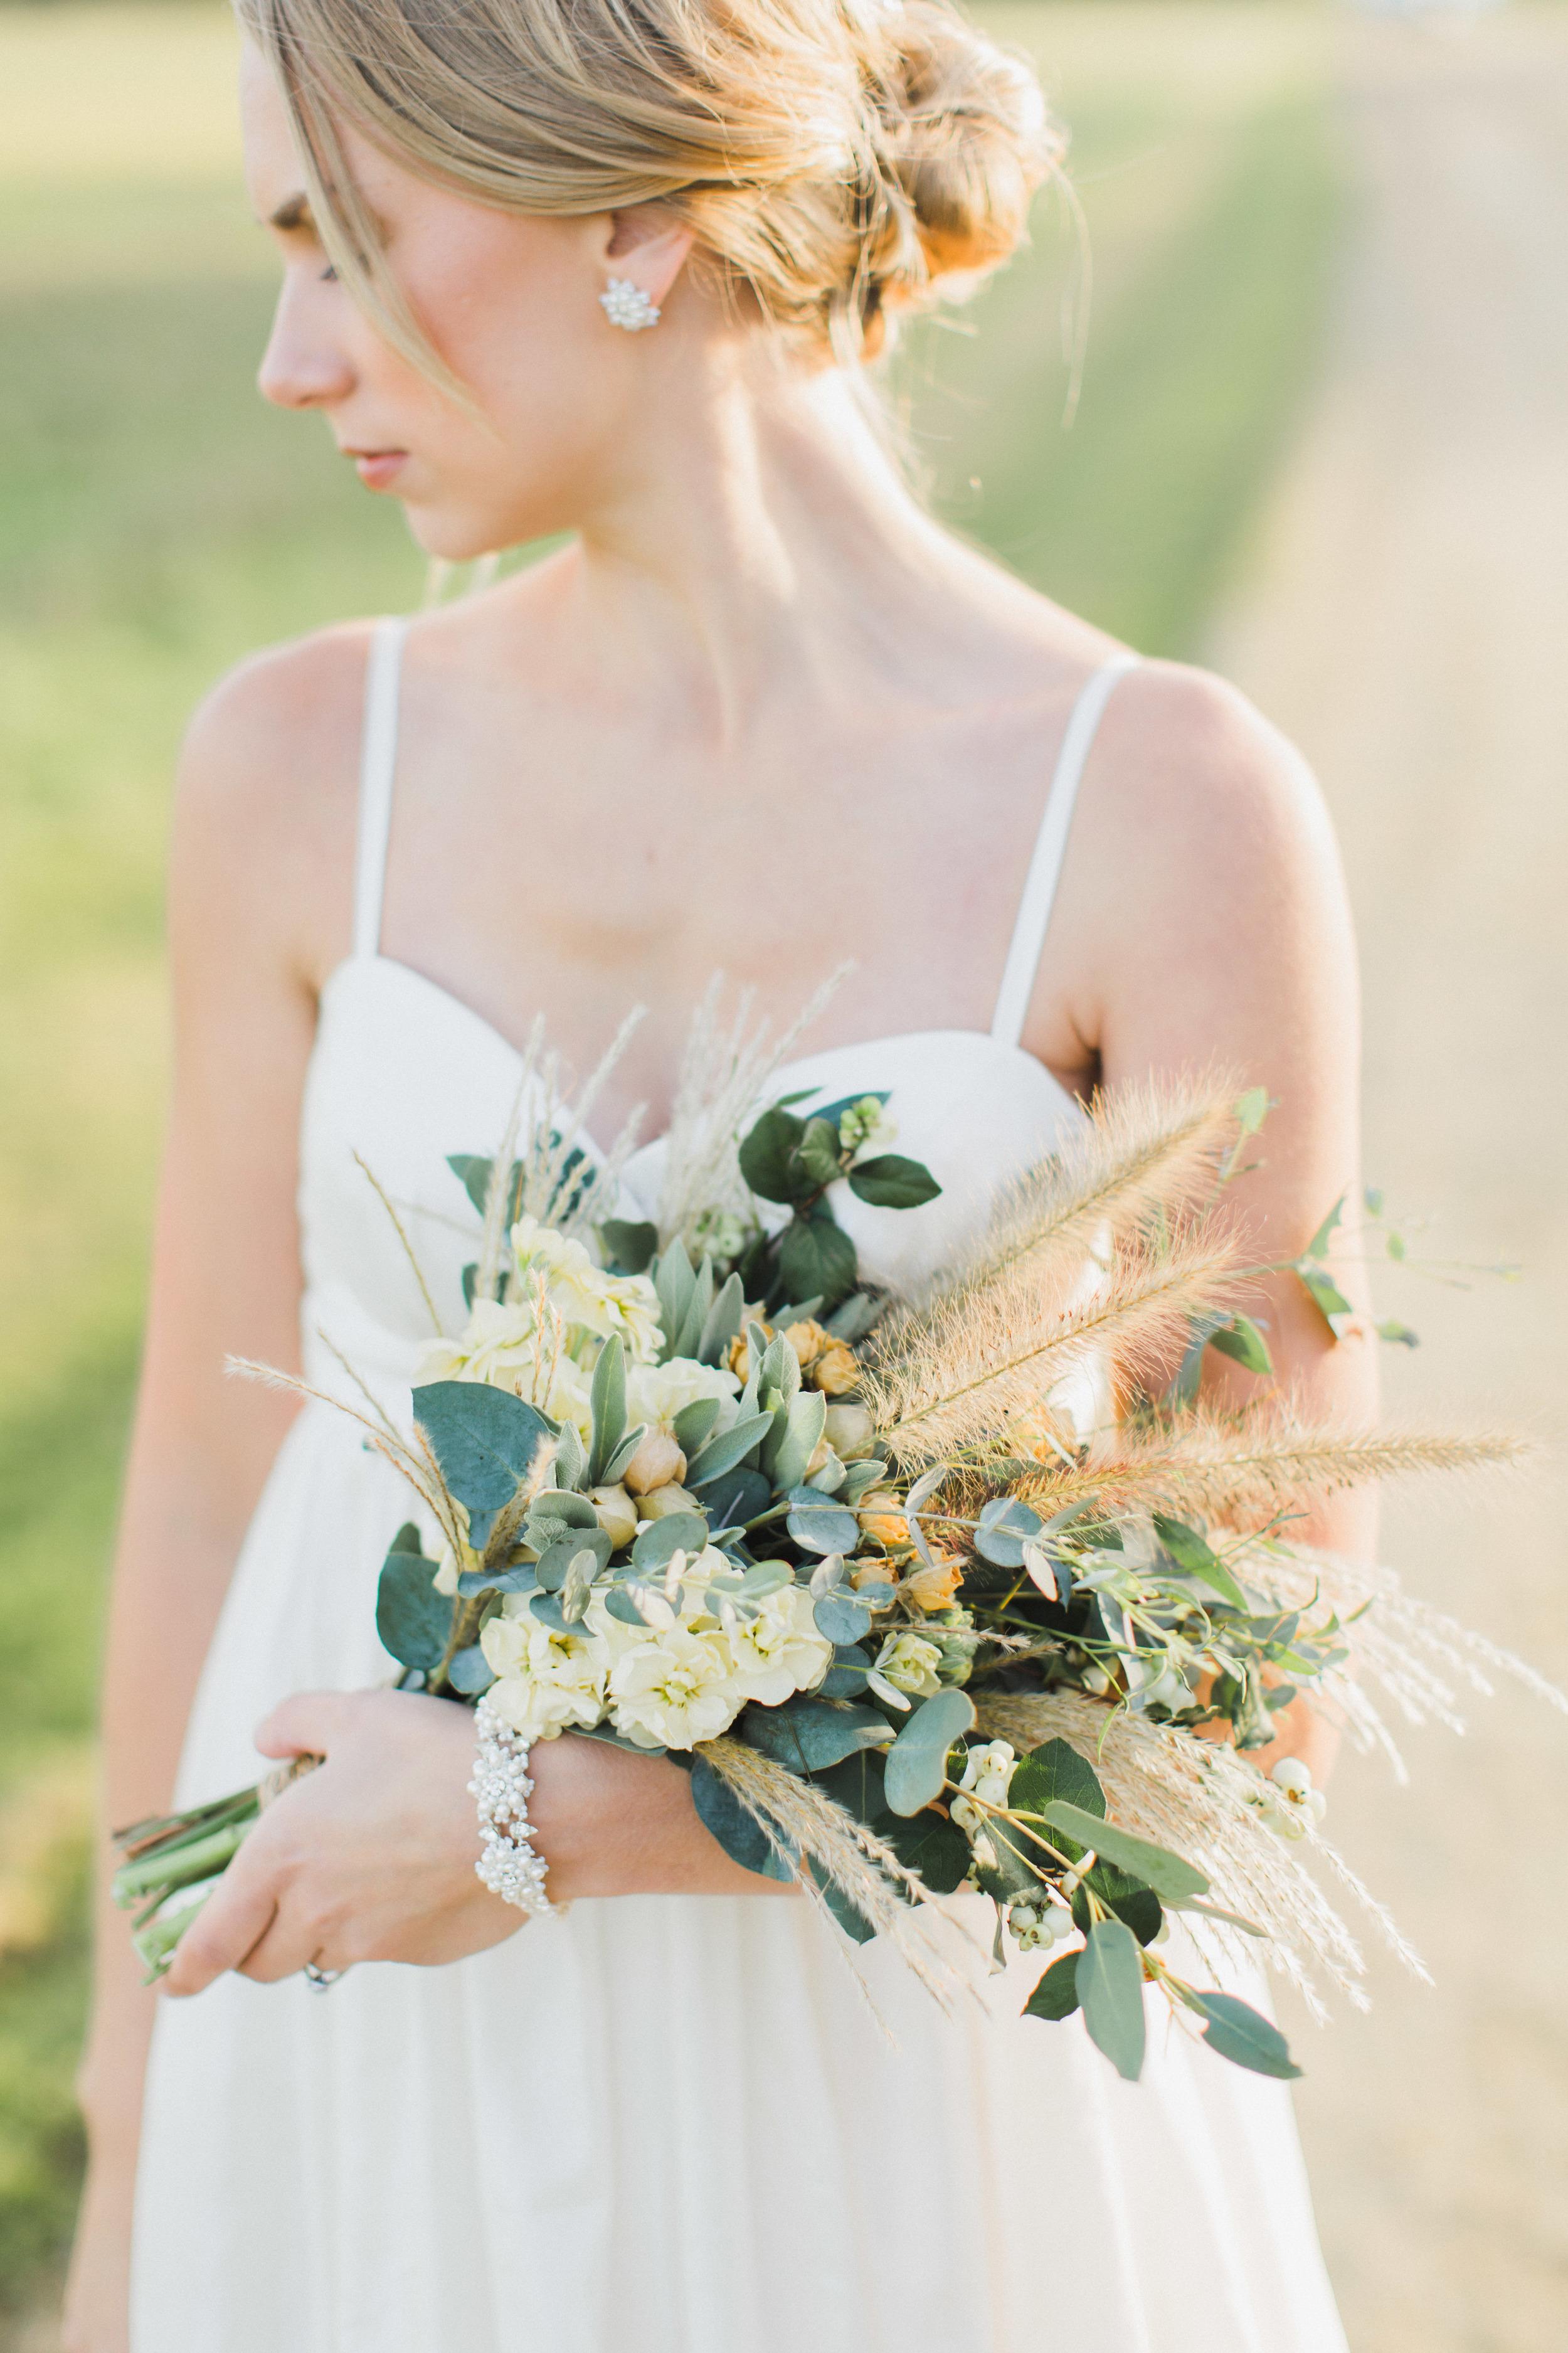 Rustic fall harvest wedding bouquet